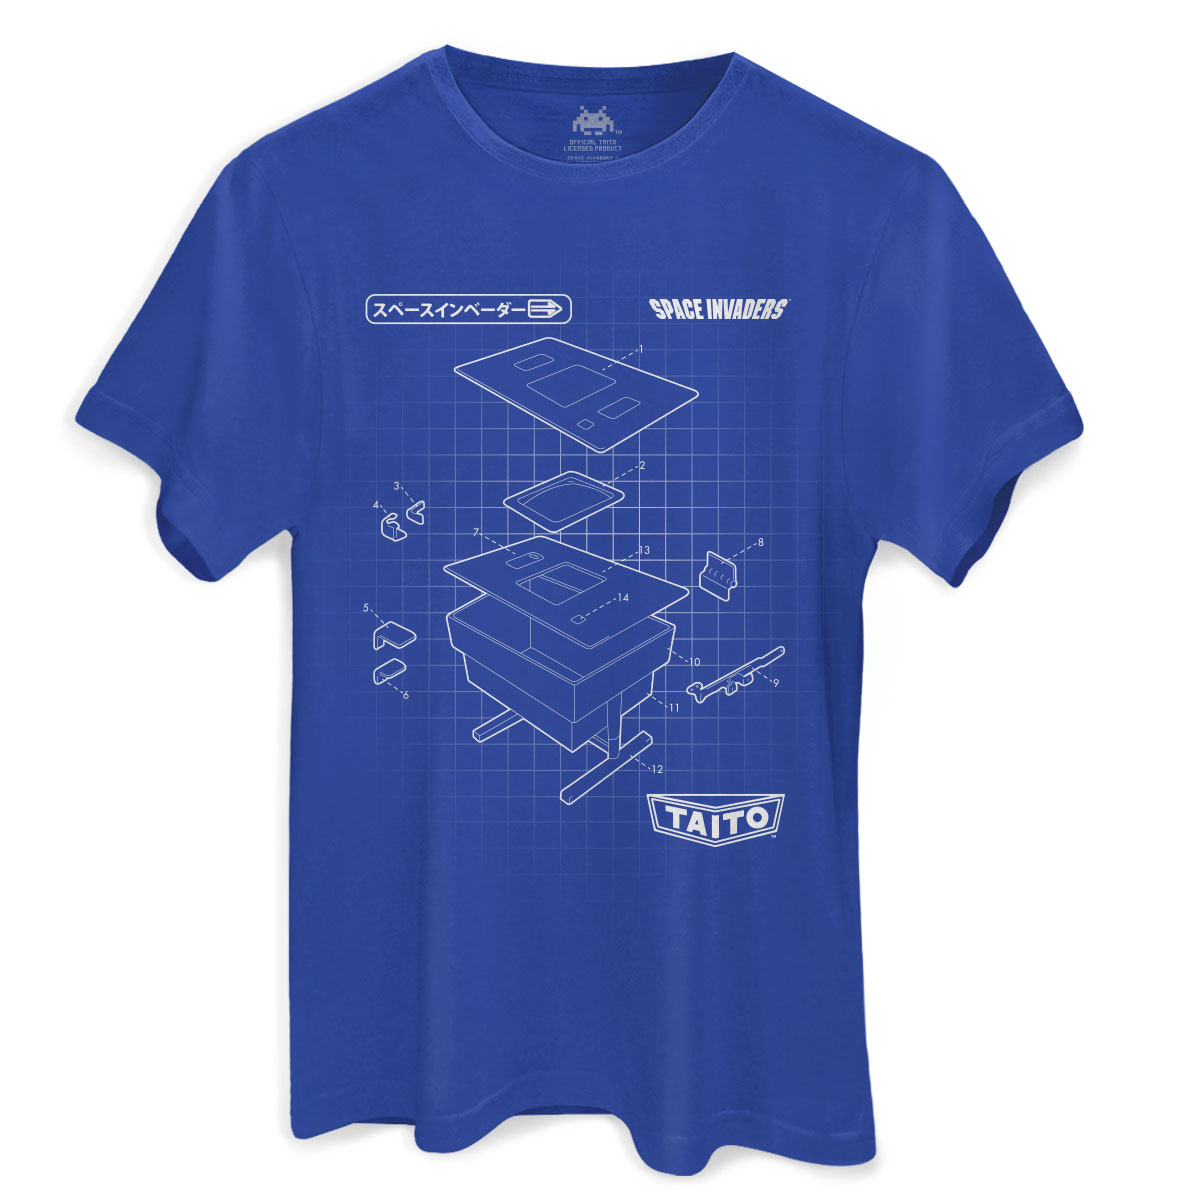 Camiseta Masculina Space Invaders TAITO Corporation  - bandUP Store Marketplace